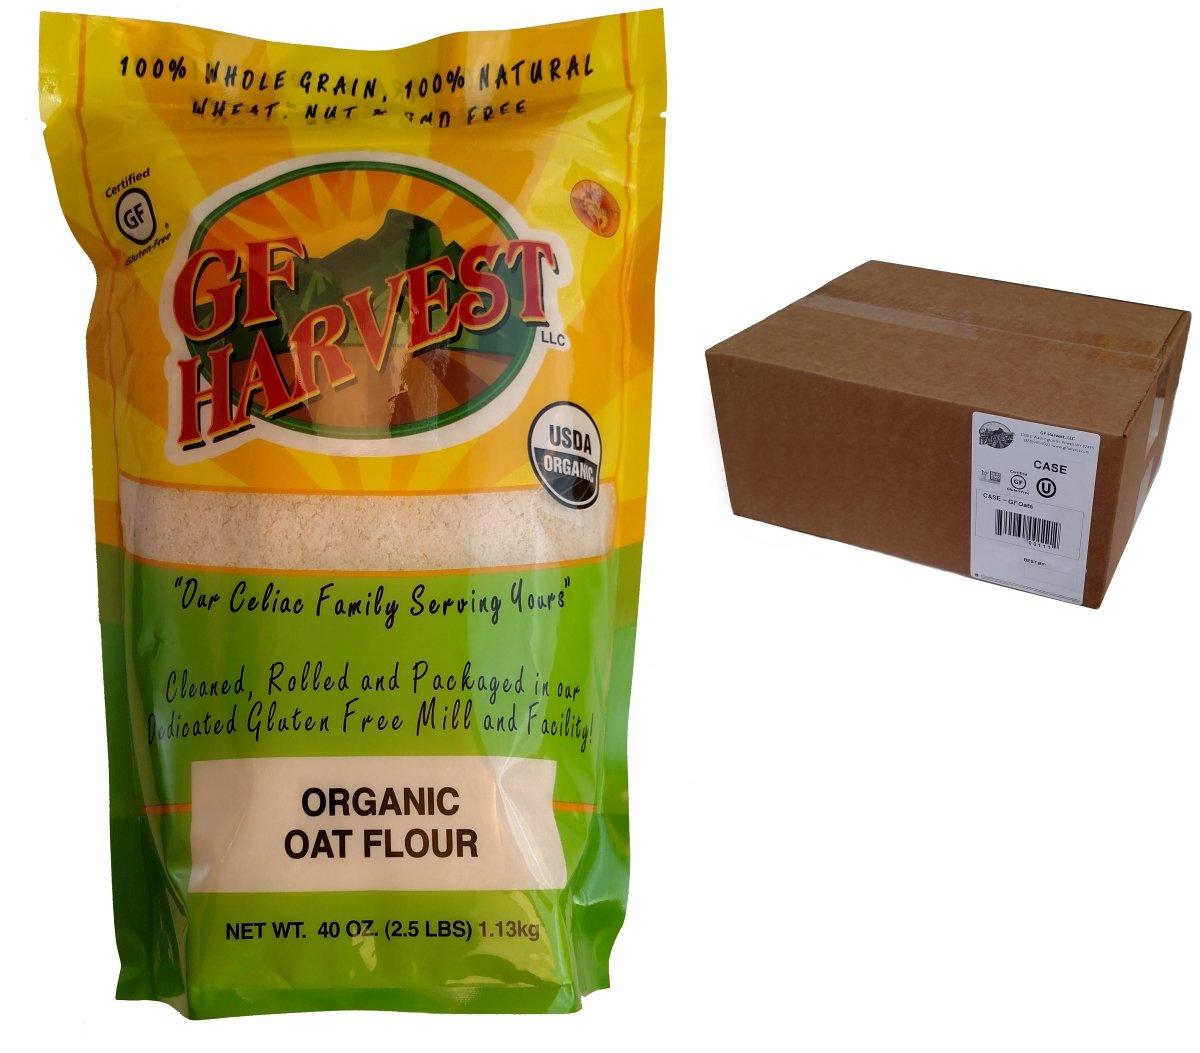 GF Harvest Organic Whole Grain Oat Flour, Gluten Free, (2.5 Pound Bag) (Pack of 6)